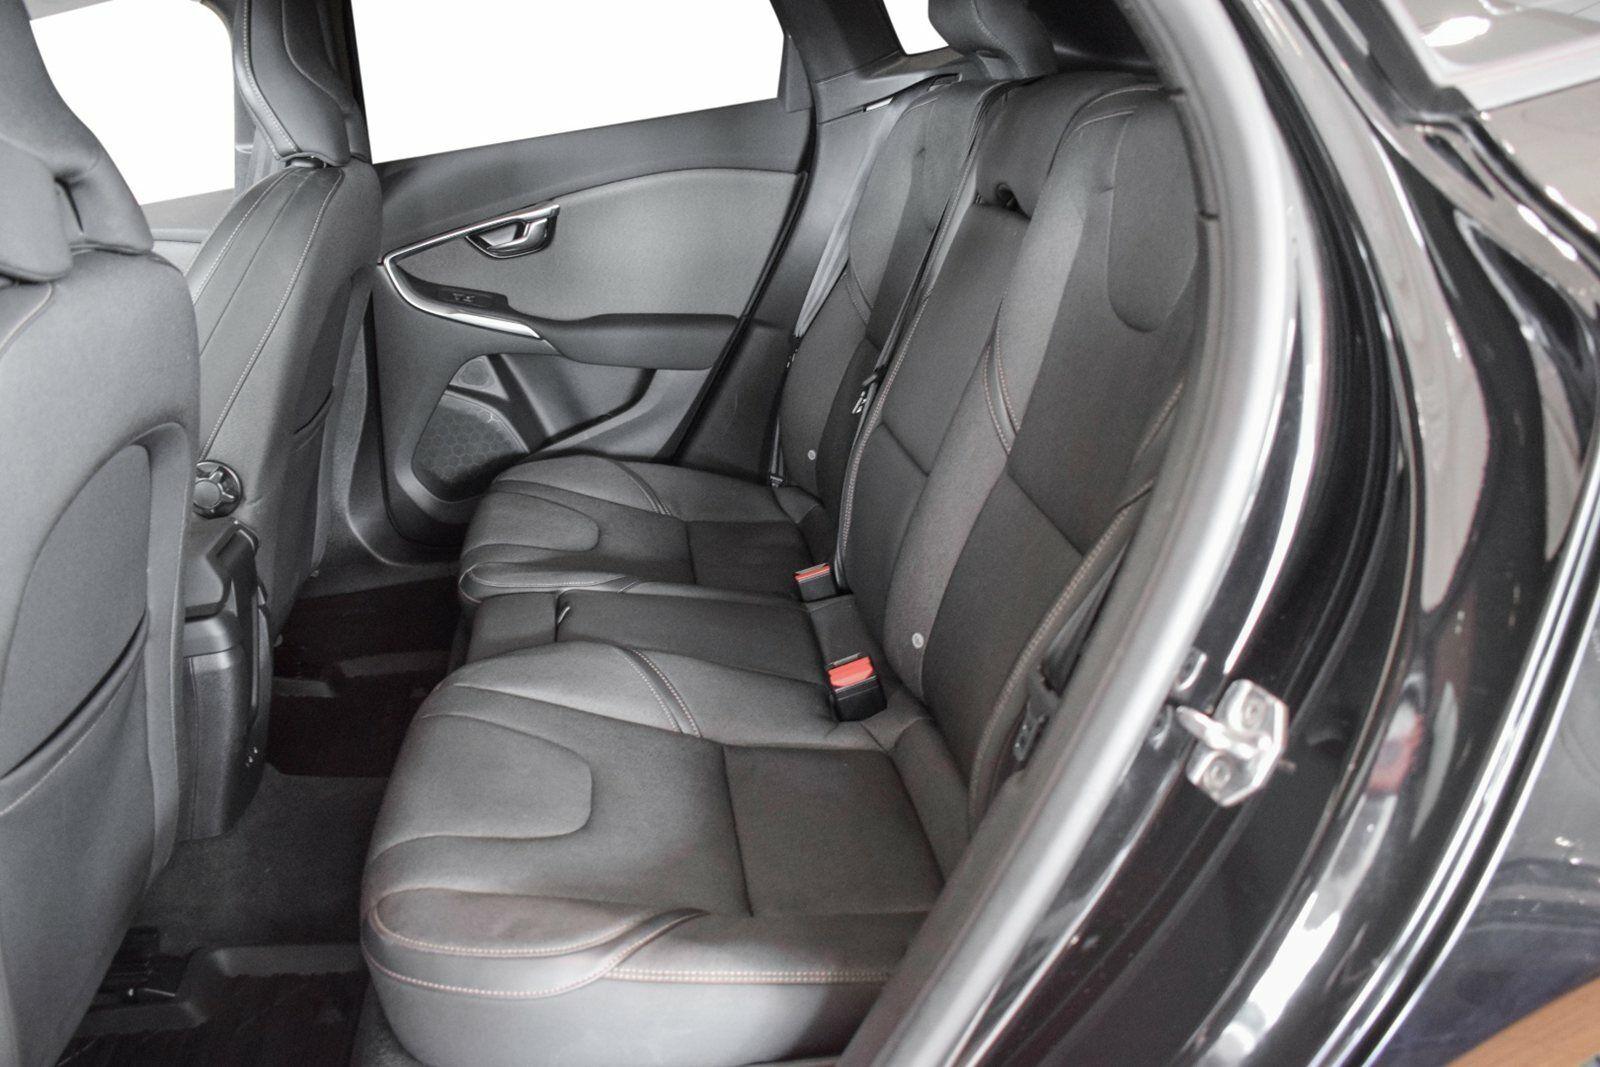 Volvo V40 CC 2,0 D3 150 Momentum aut. - billede 7